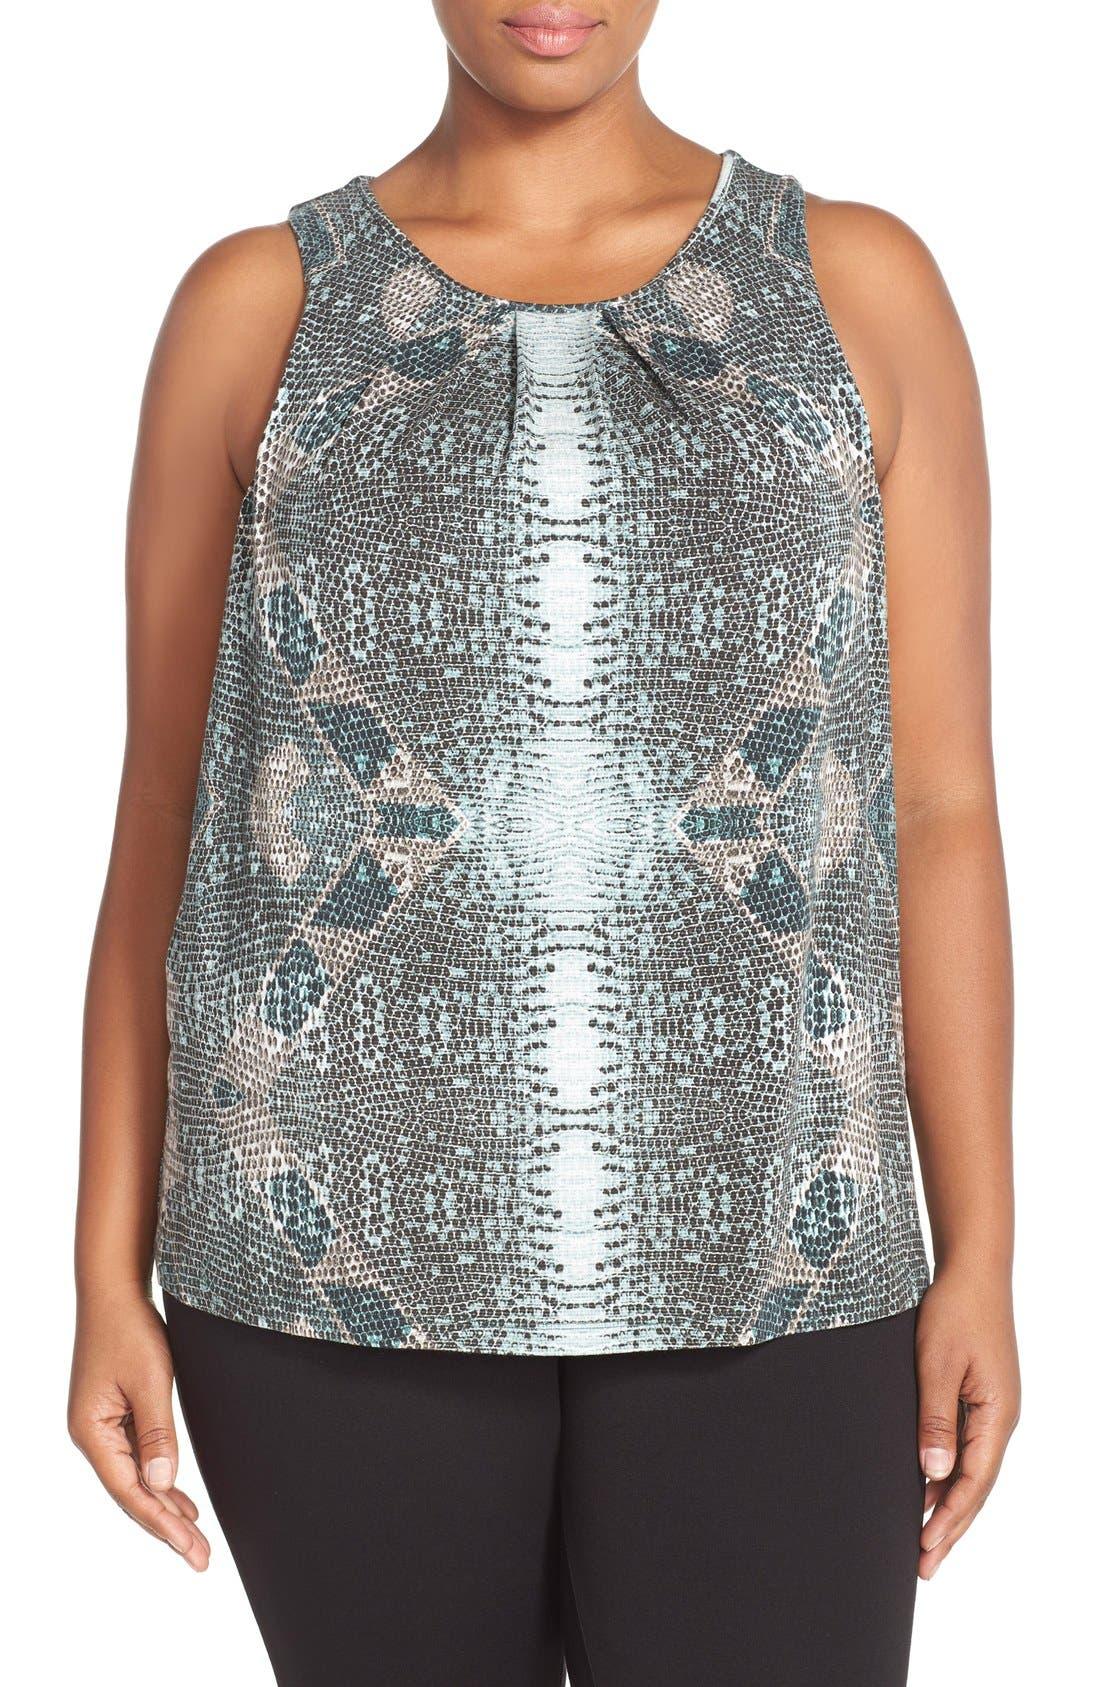 Main Image - Tart 'Jewell' Pleat Neck Print Top (Plus Size)